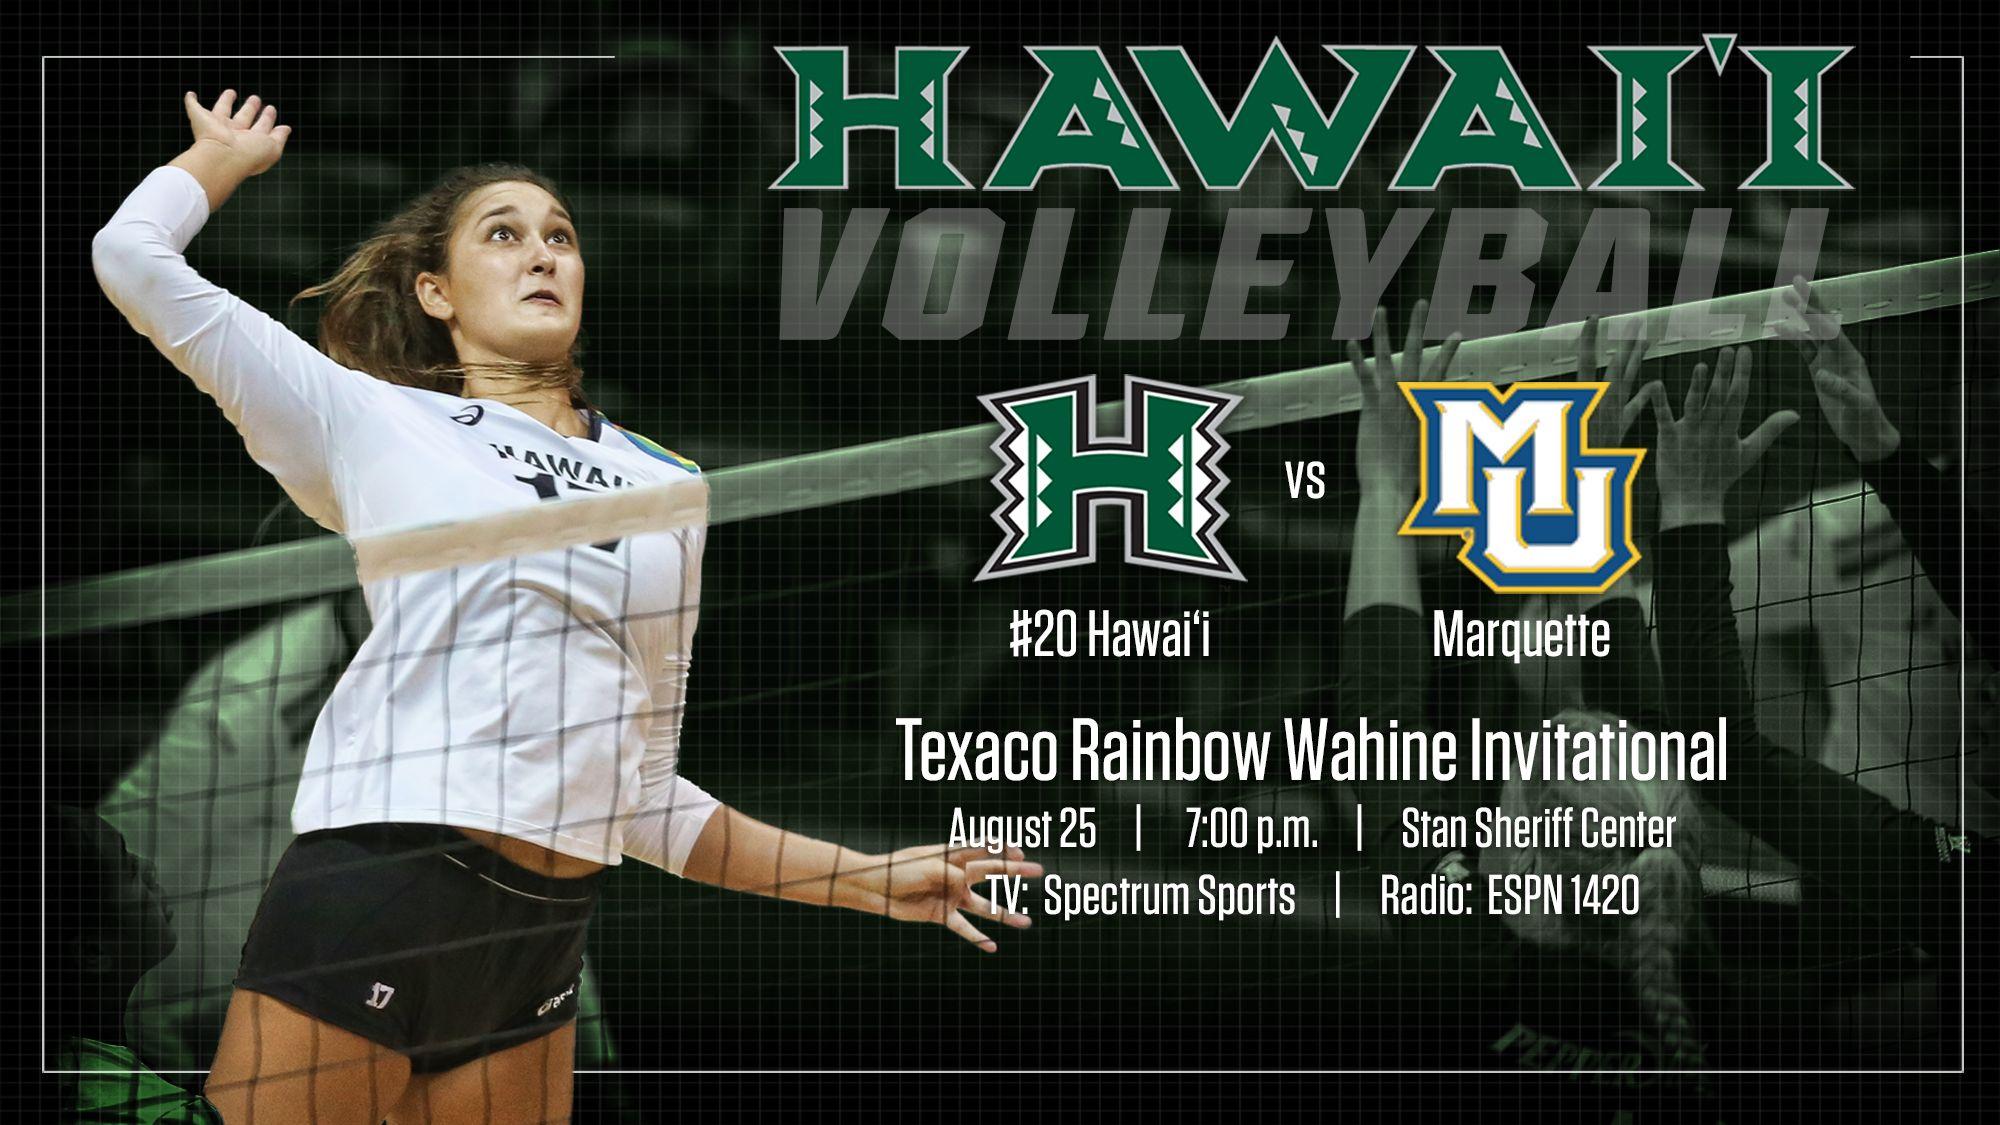 Hawai I Volleyball Social Media Graphic Social Media Radio Hawaii